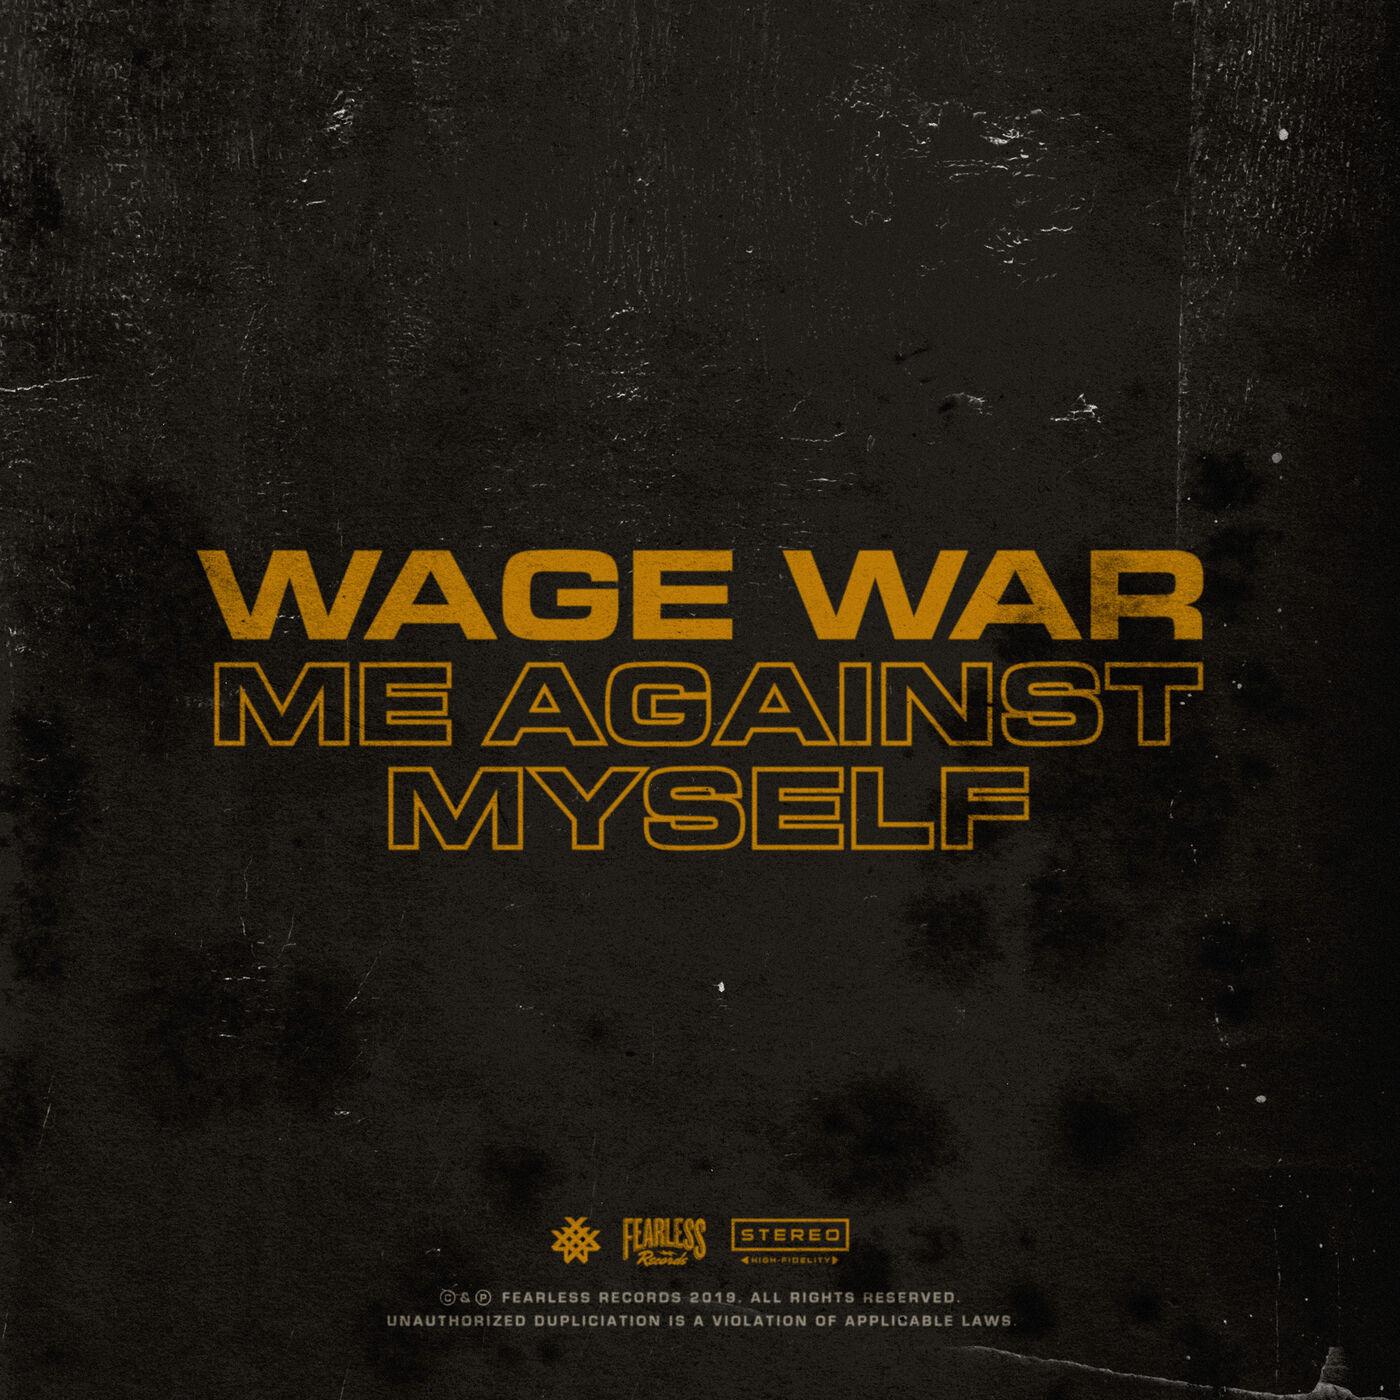 Wage War - Me Against Myself [single] (2019)